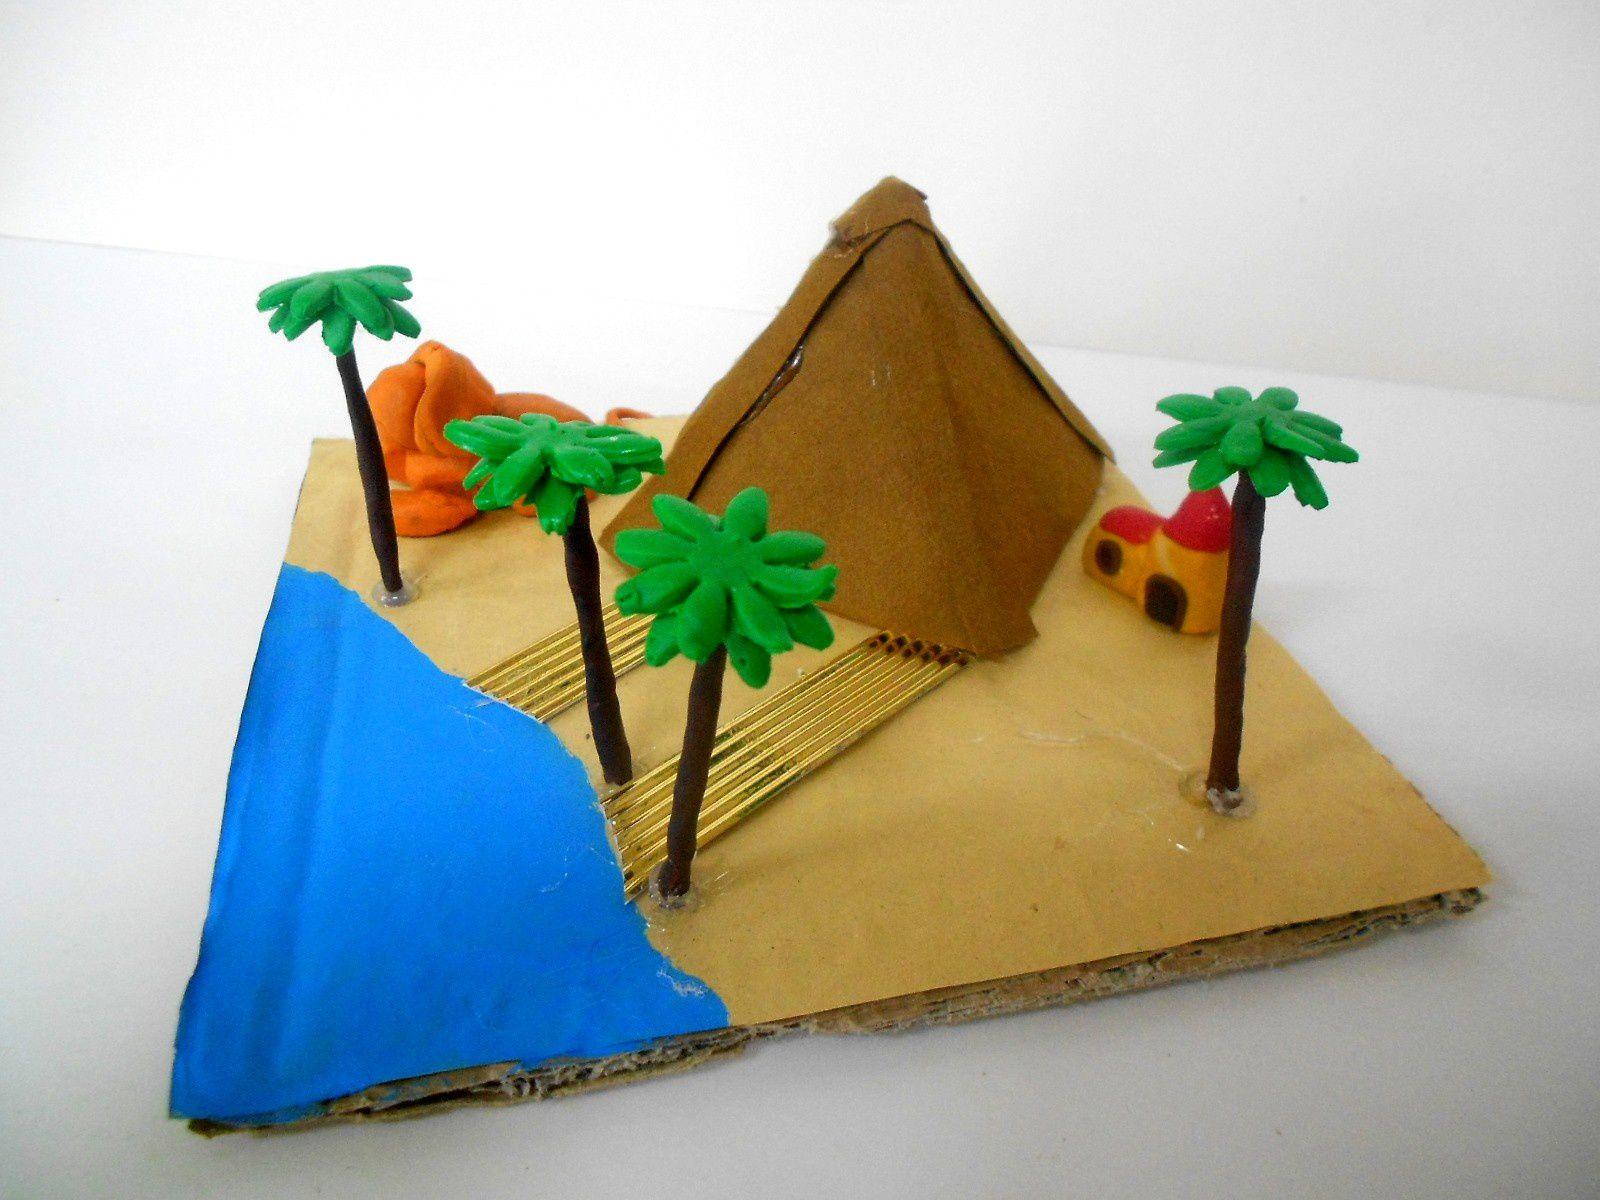 Maquette de pyramide - 6°